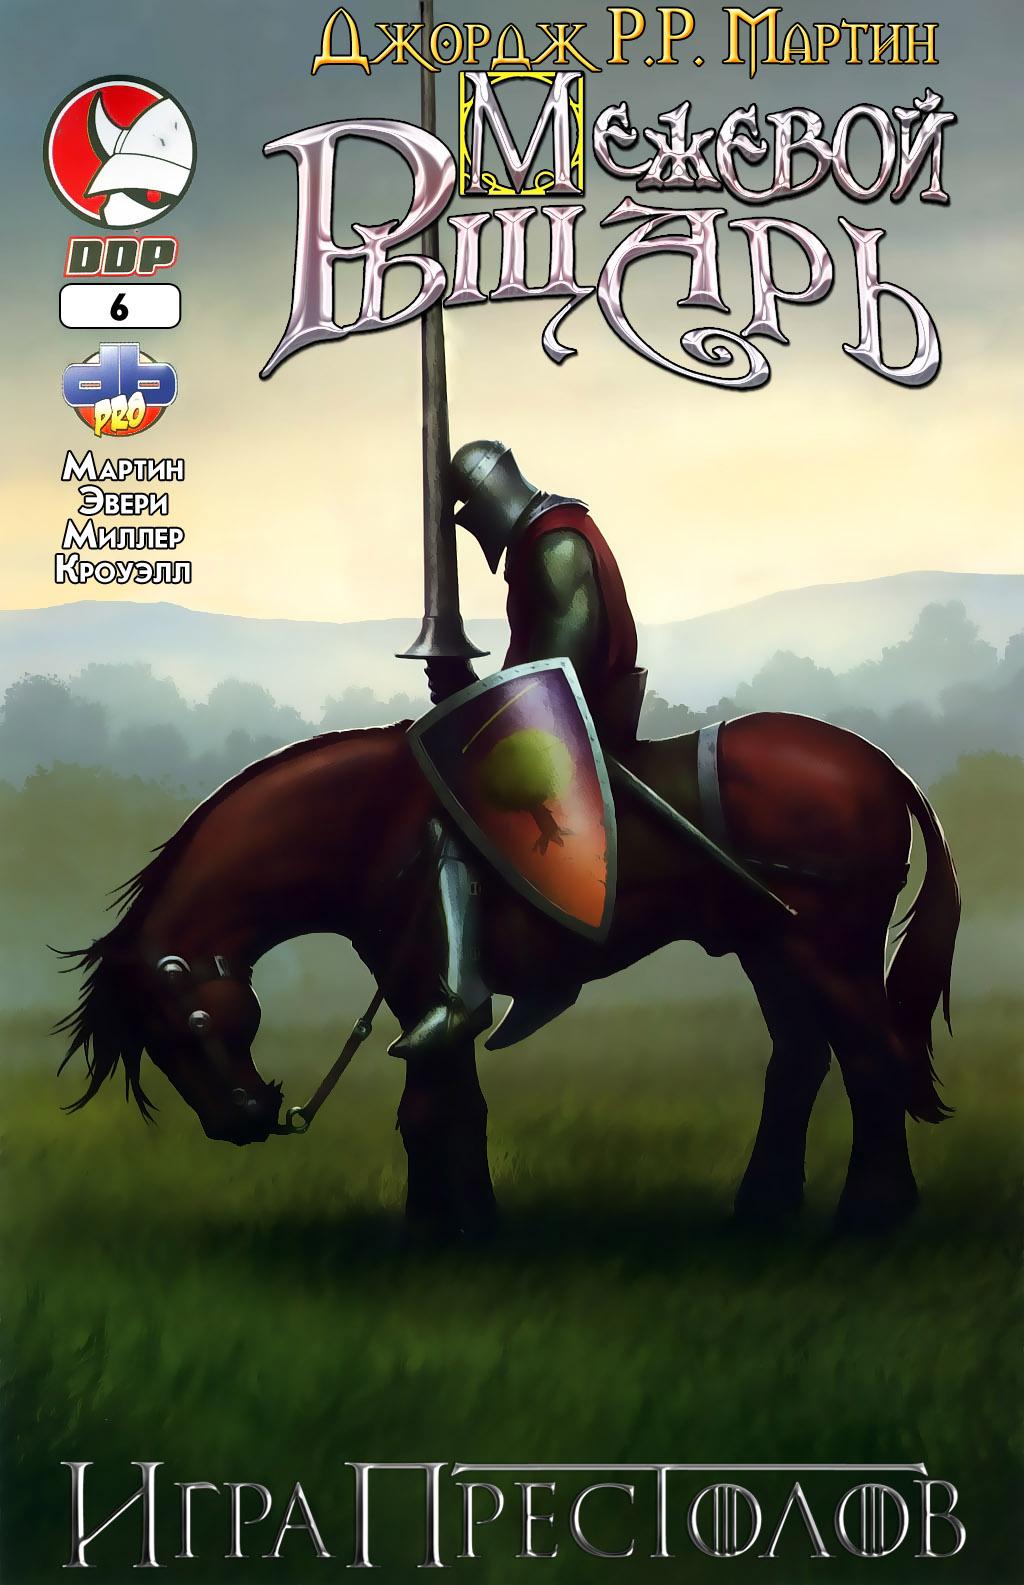 Комикс Игра Престолов: Межевой Рыцарь